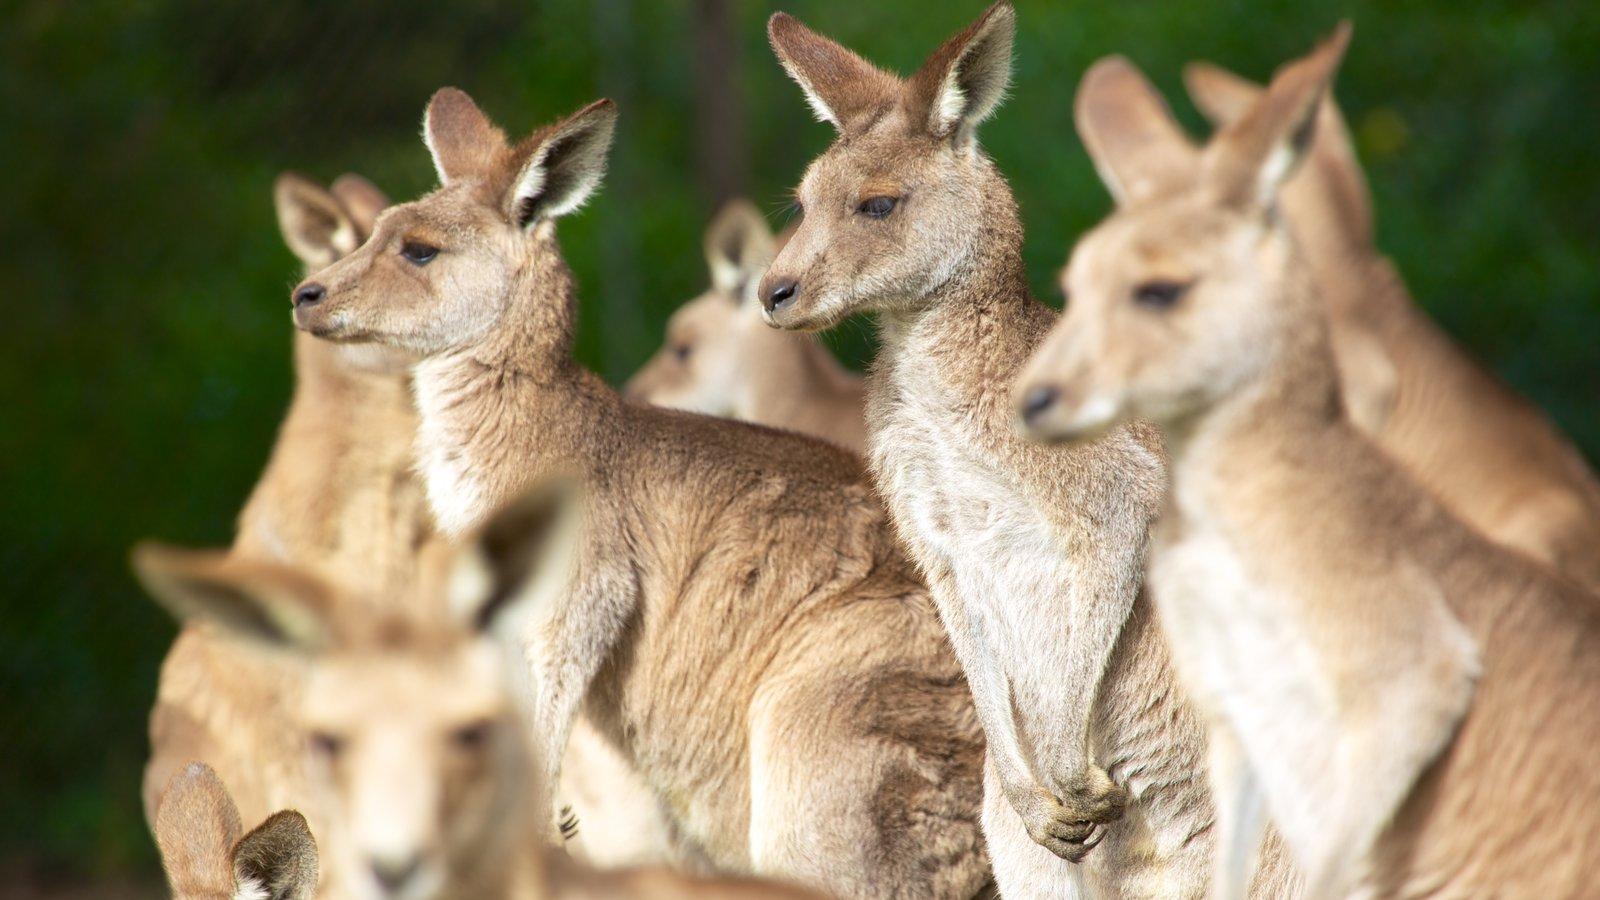 Lone Pine Koala Sanctuary featuring land animals and zoo animals